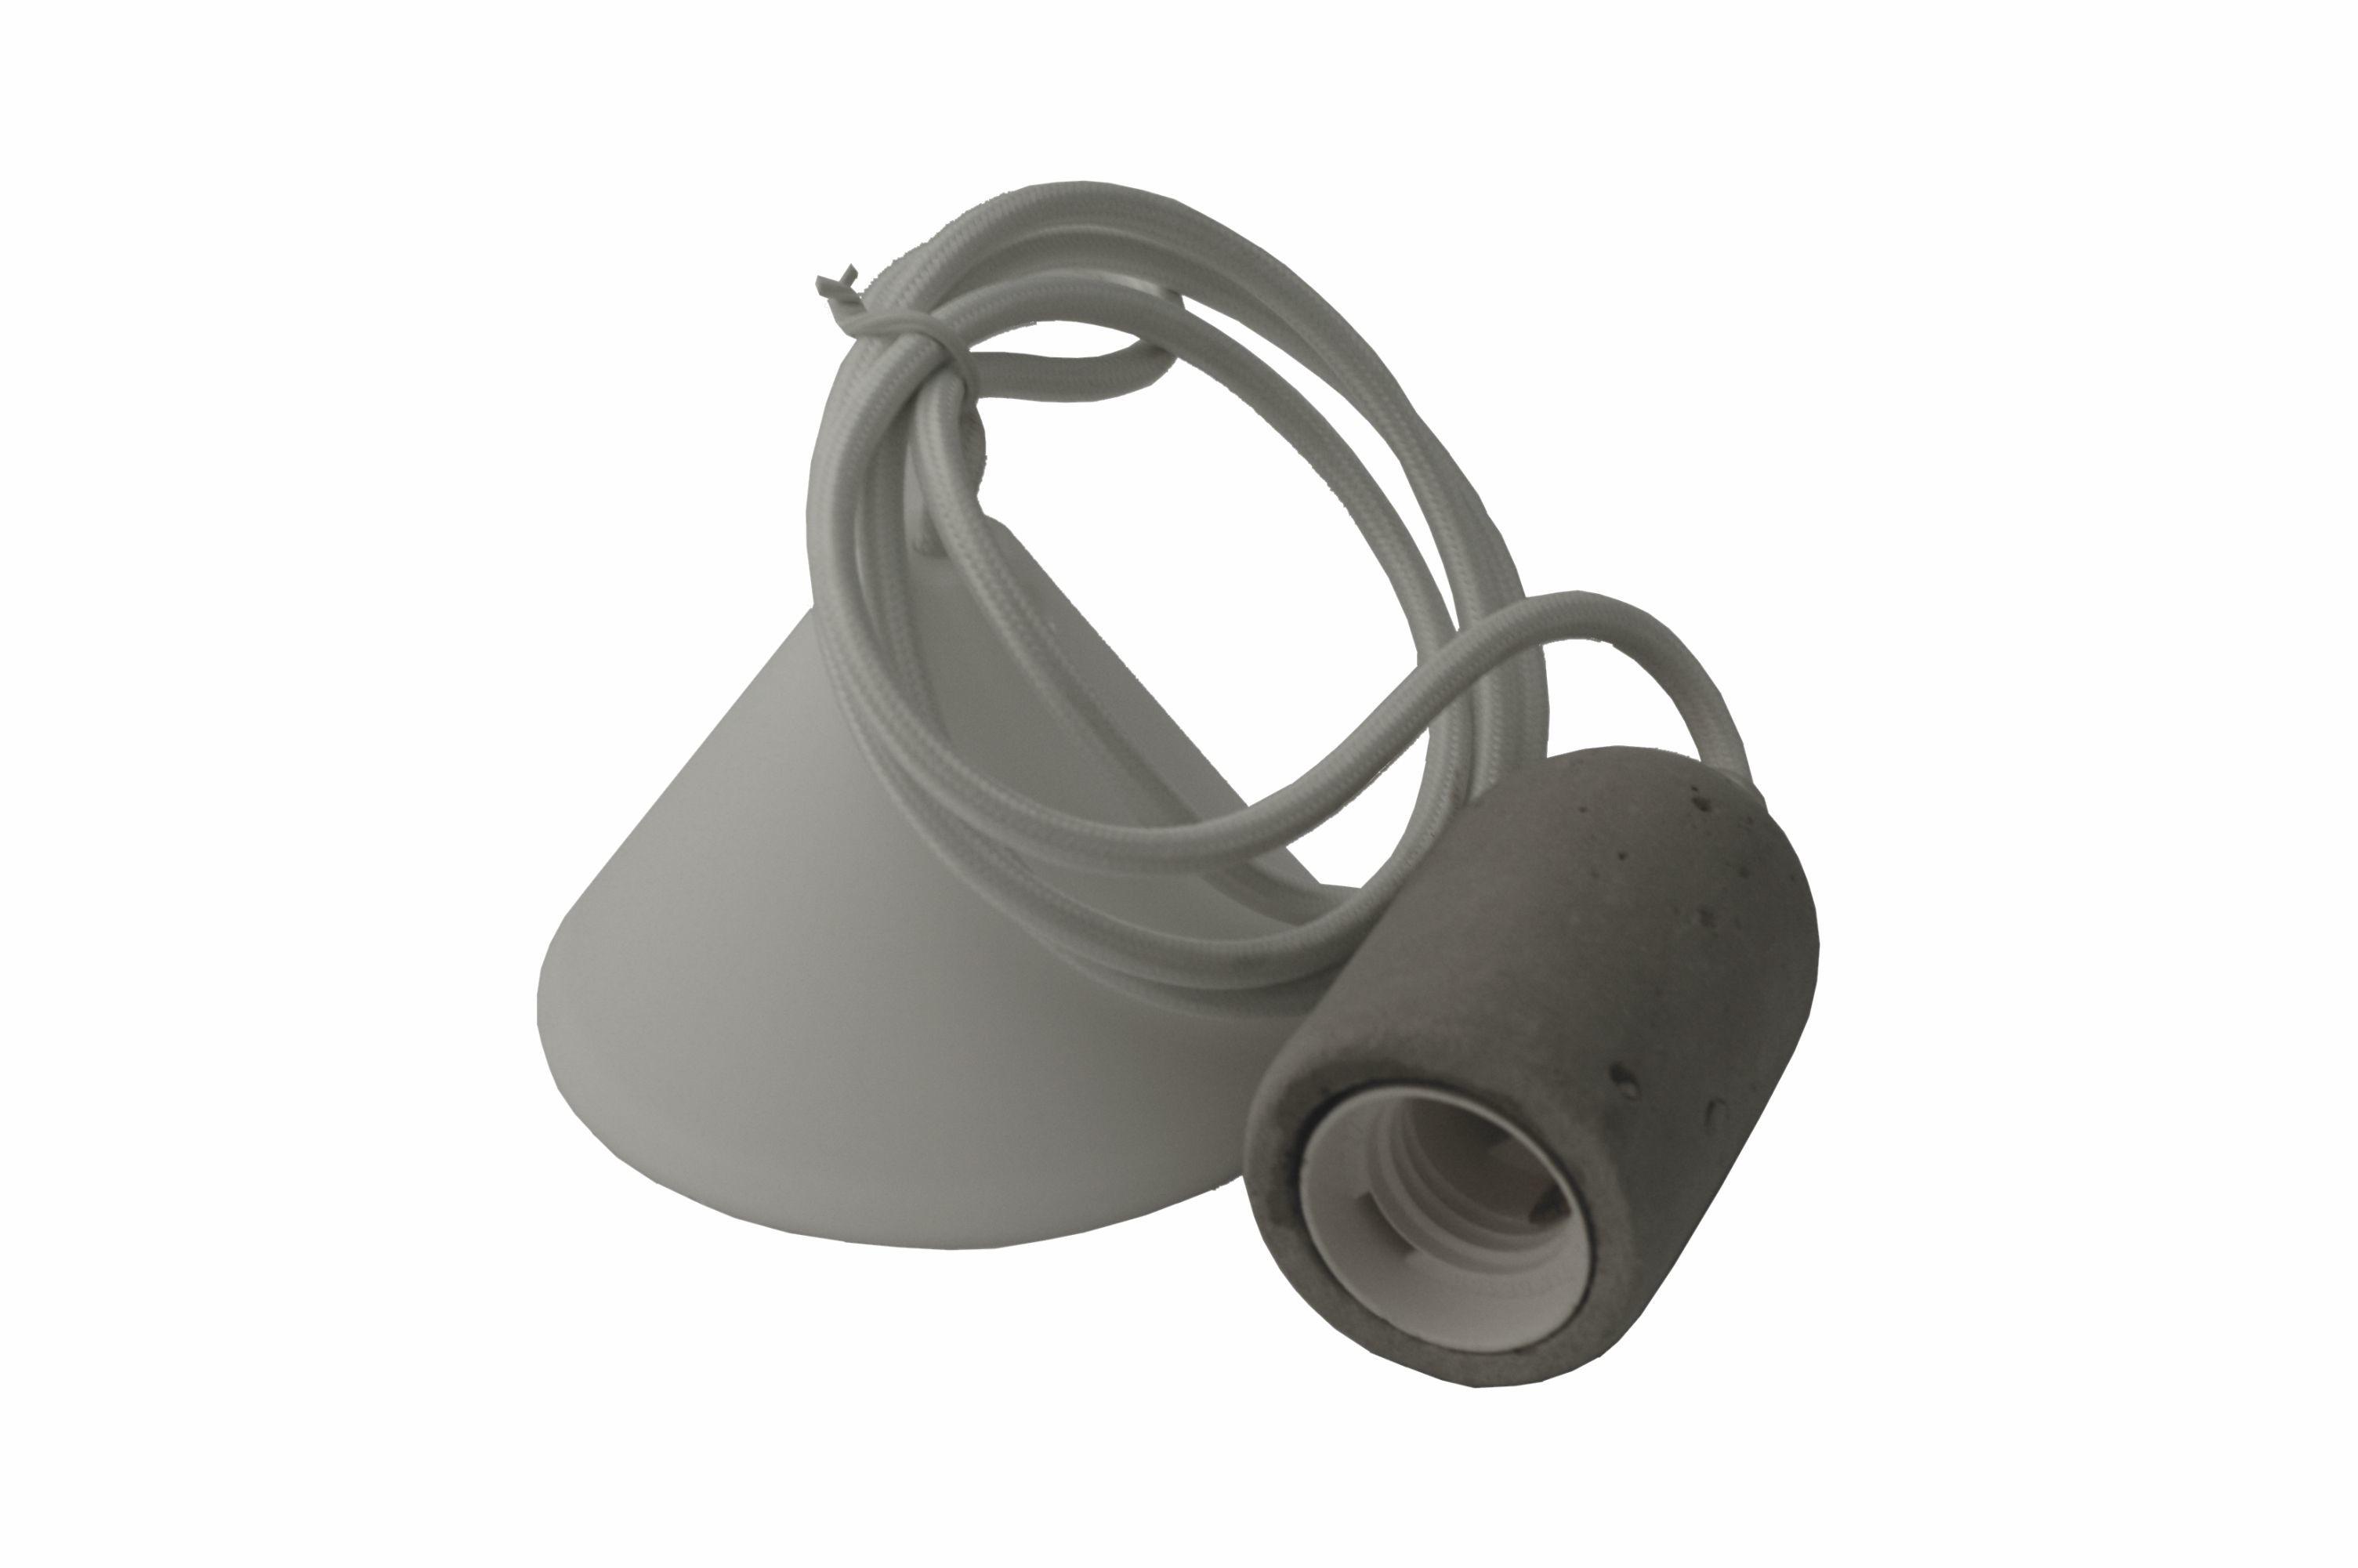 Lampa wisząca betonowa E27 biała